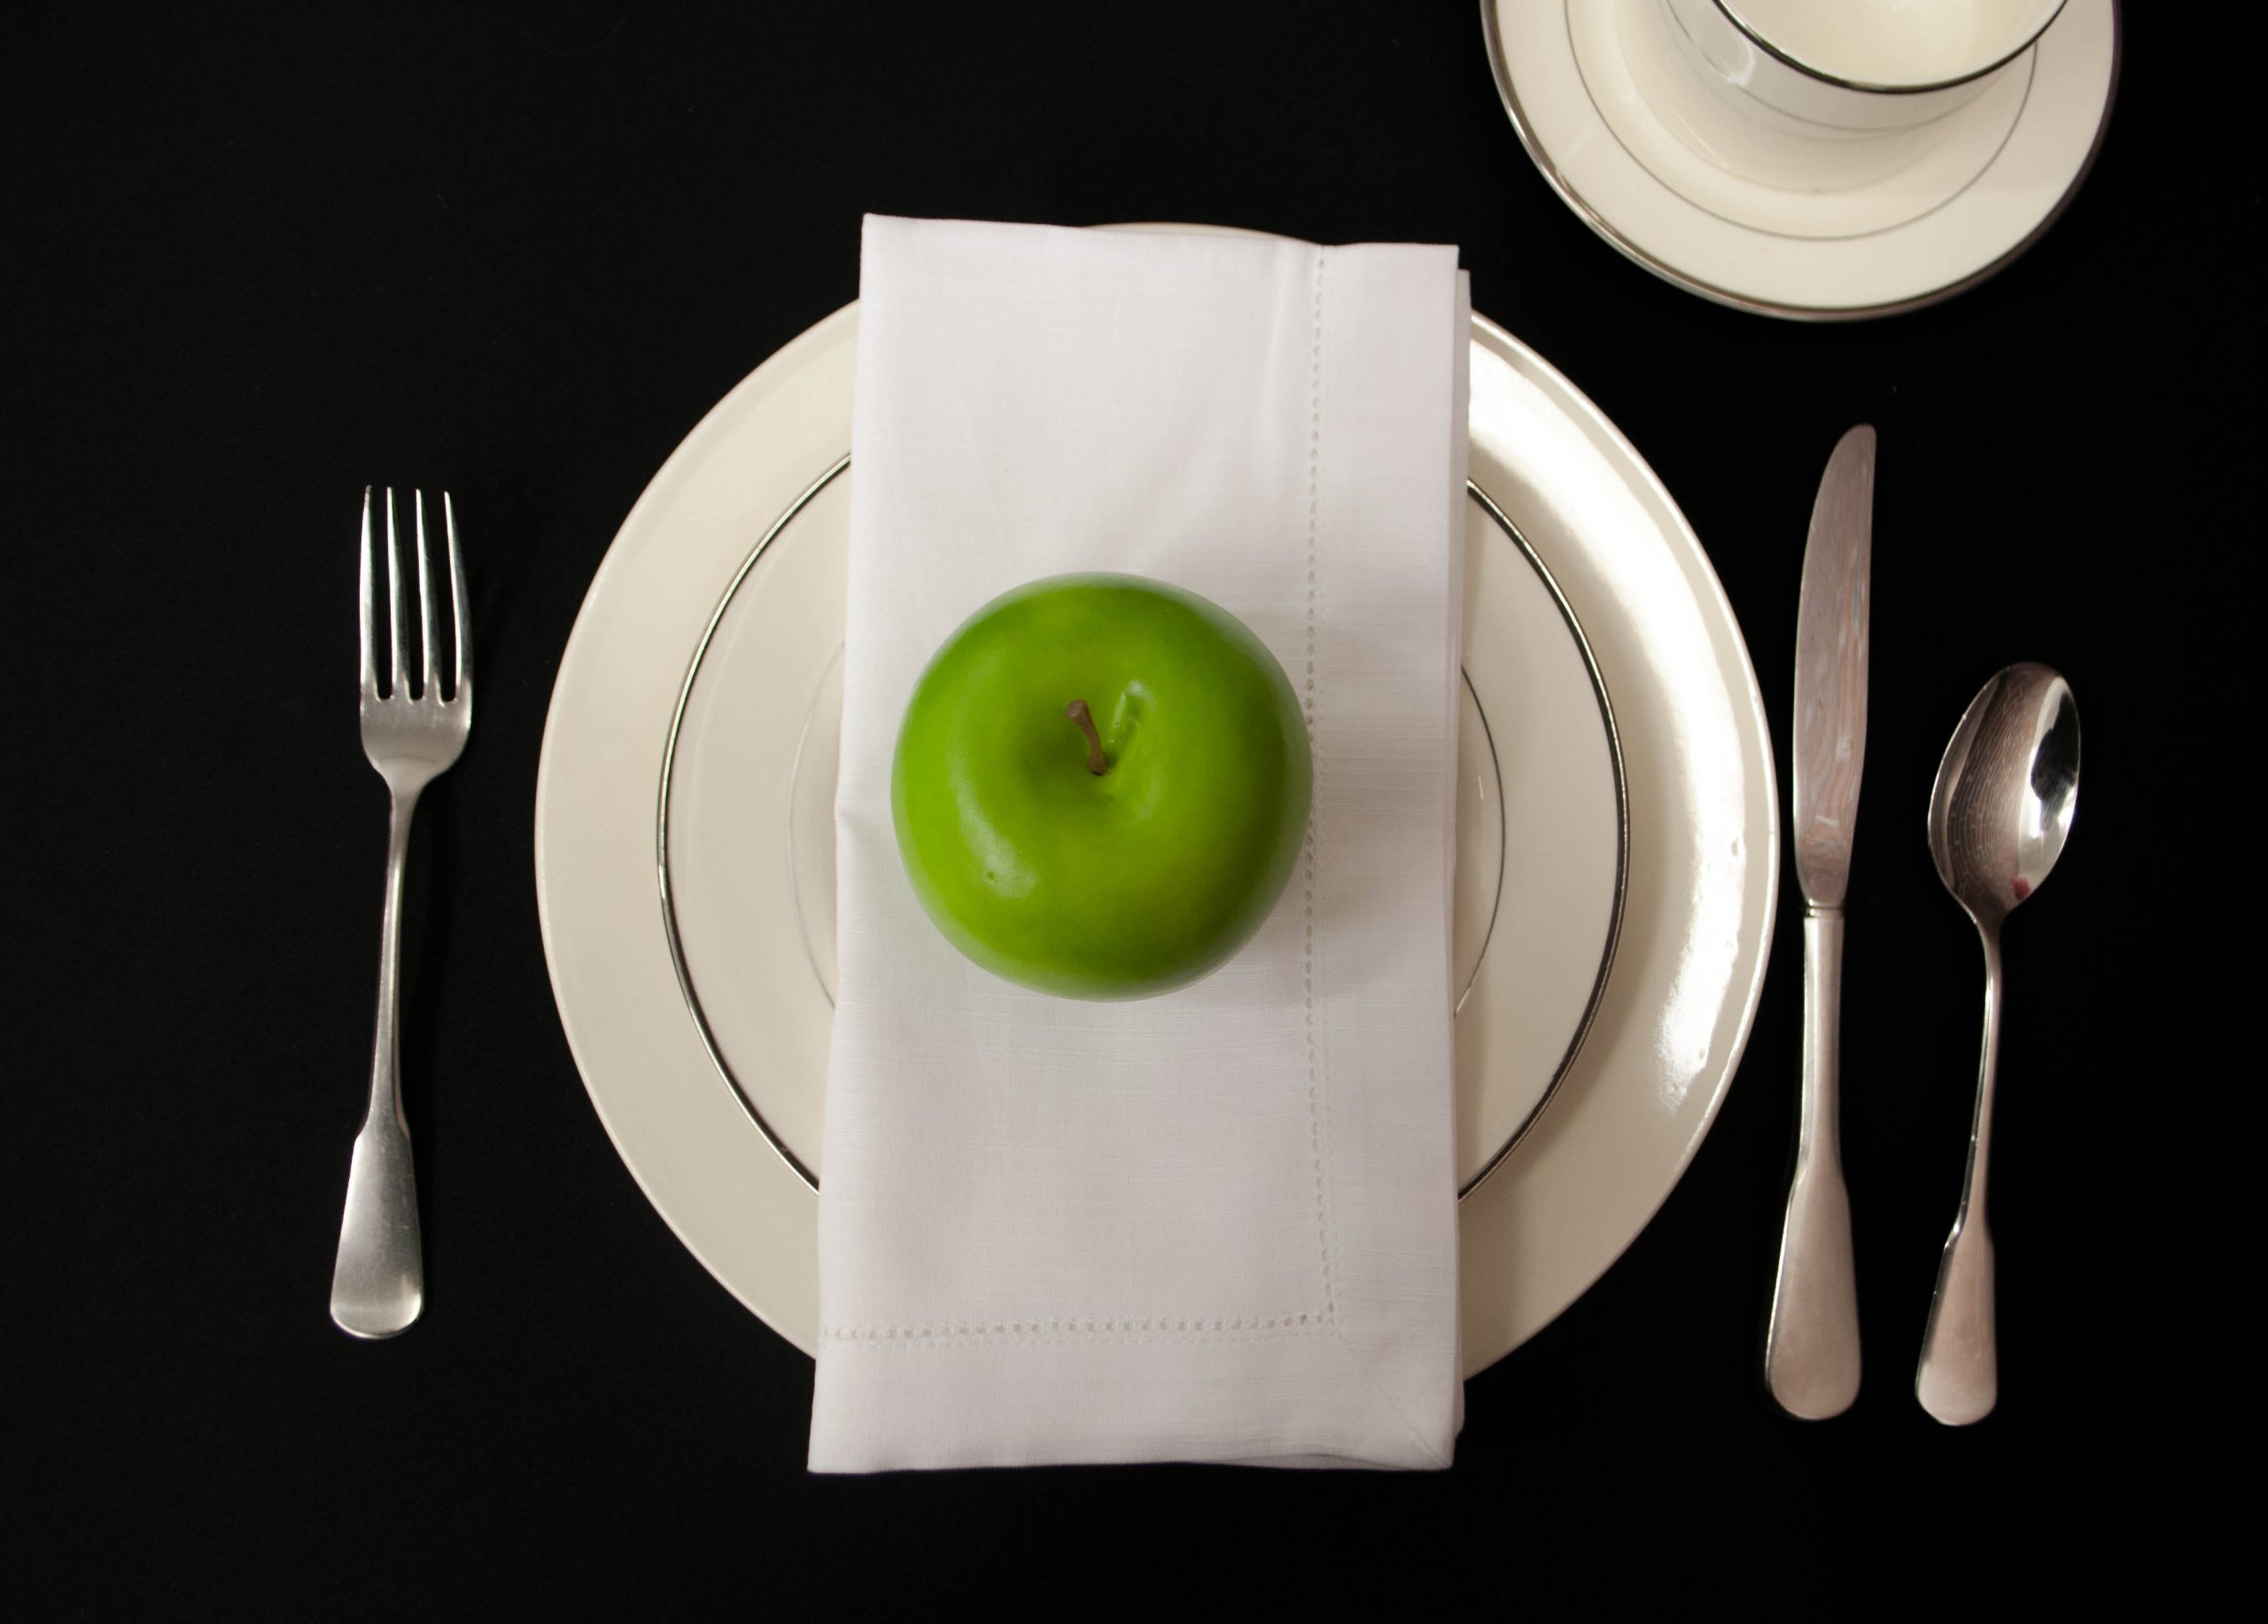 Hemstitch Dinner Napkins White 1 Dozen by Something Different Linen by Something Different Linen (Image #5)